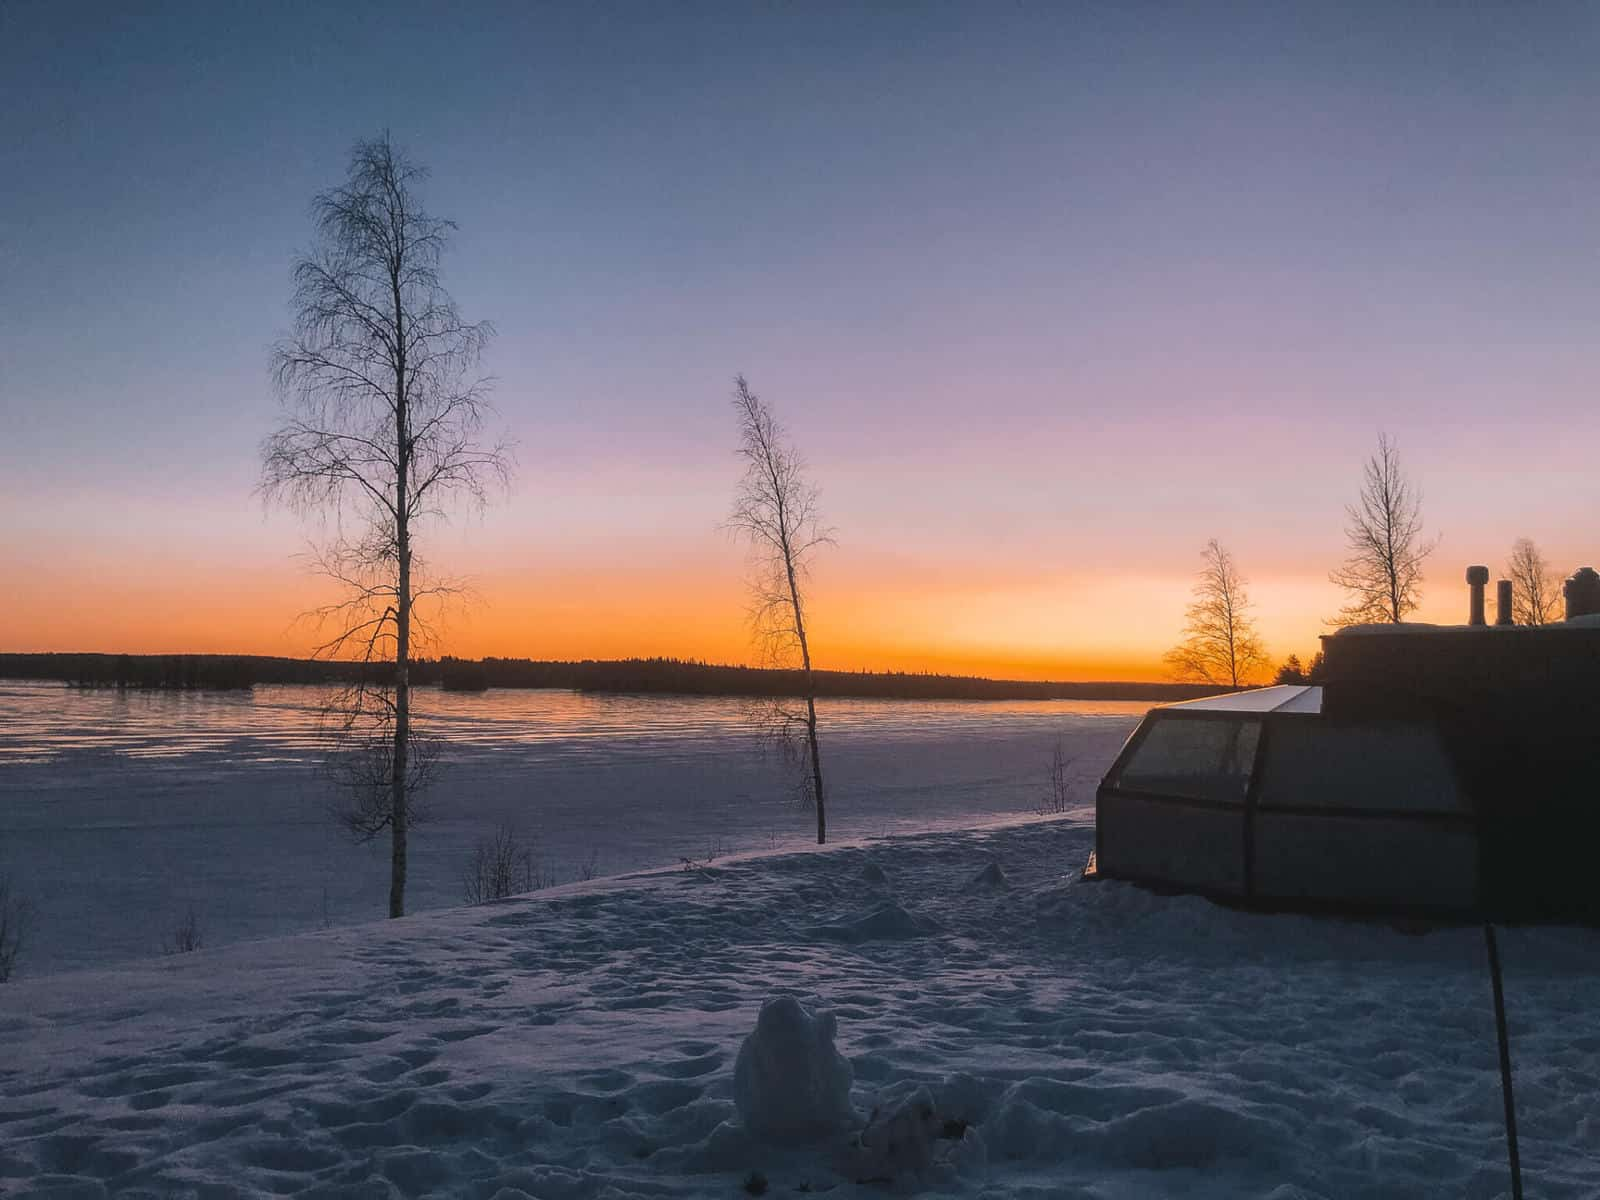 Arctic Fox Igloos: A night in luxury under the stars